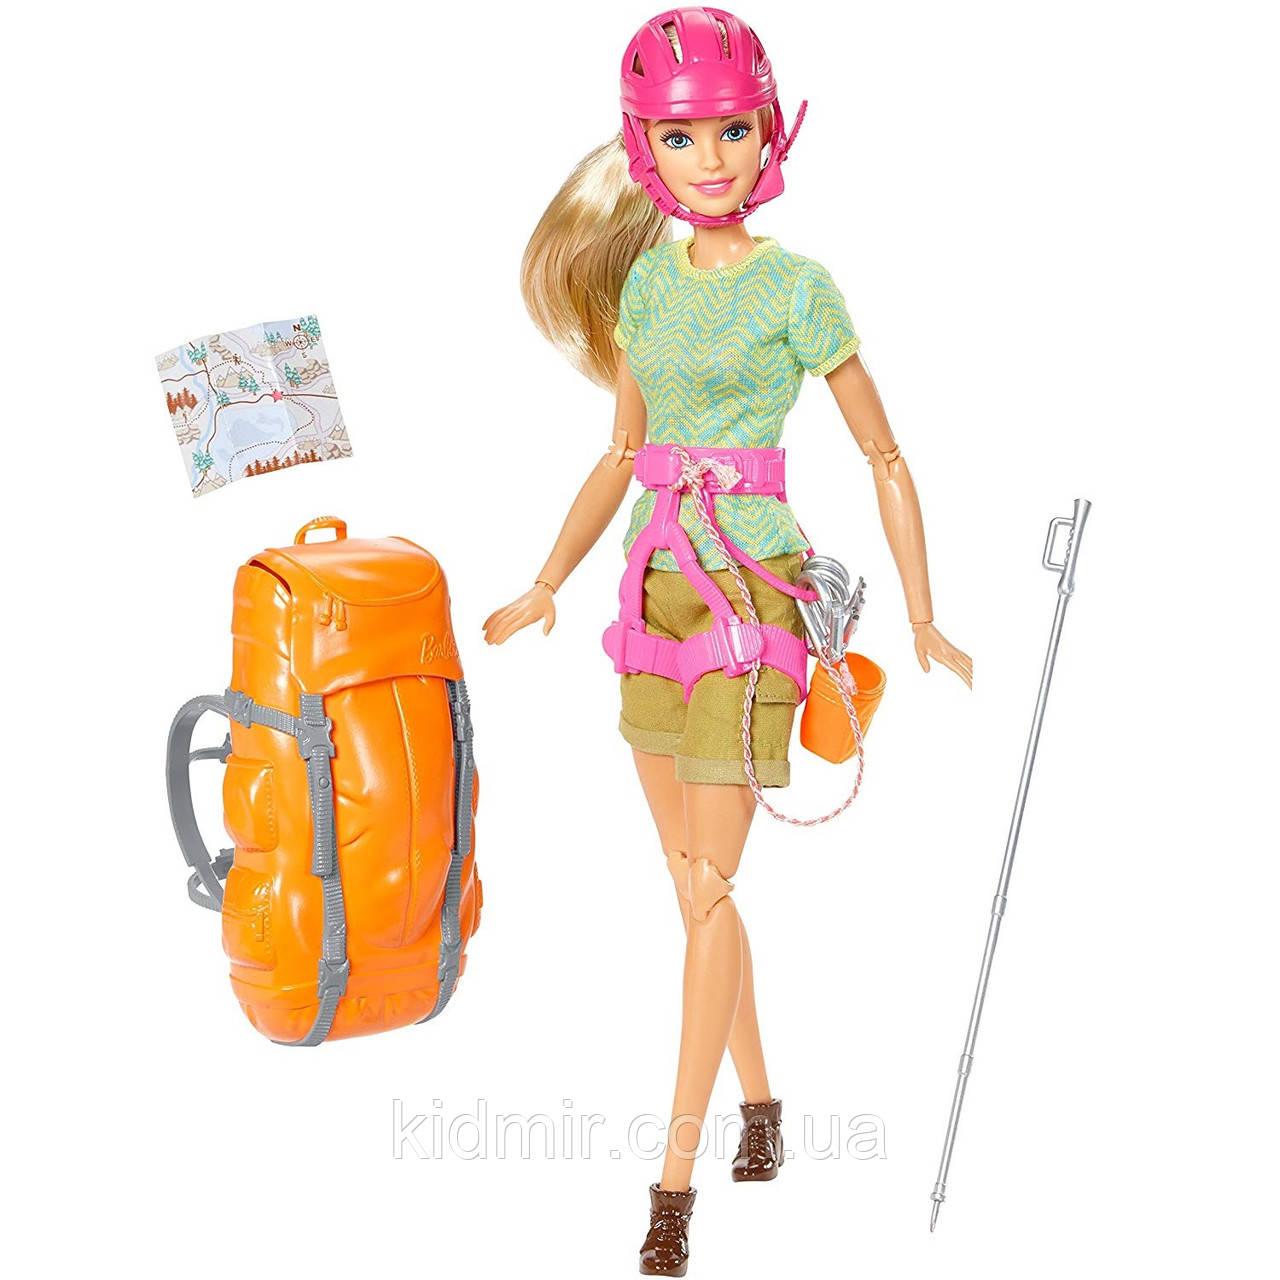 Кукла Барби Скалолазка Альпинистка Barbie Made to Move Ultimate Rock Climber FGC97